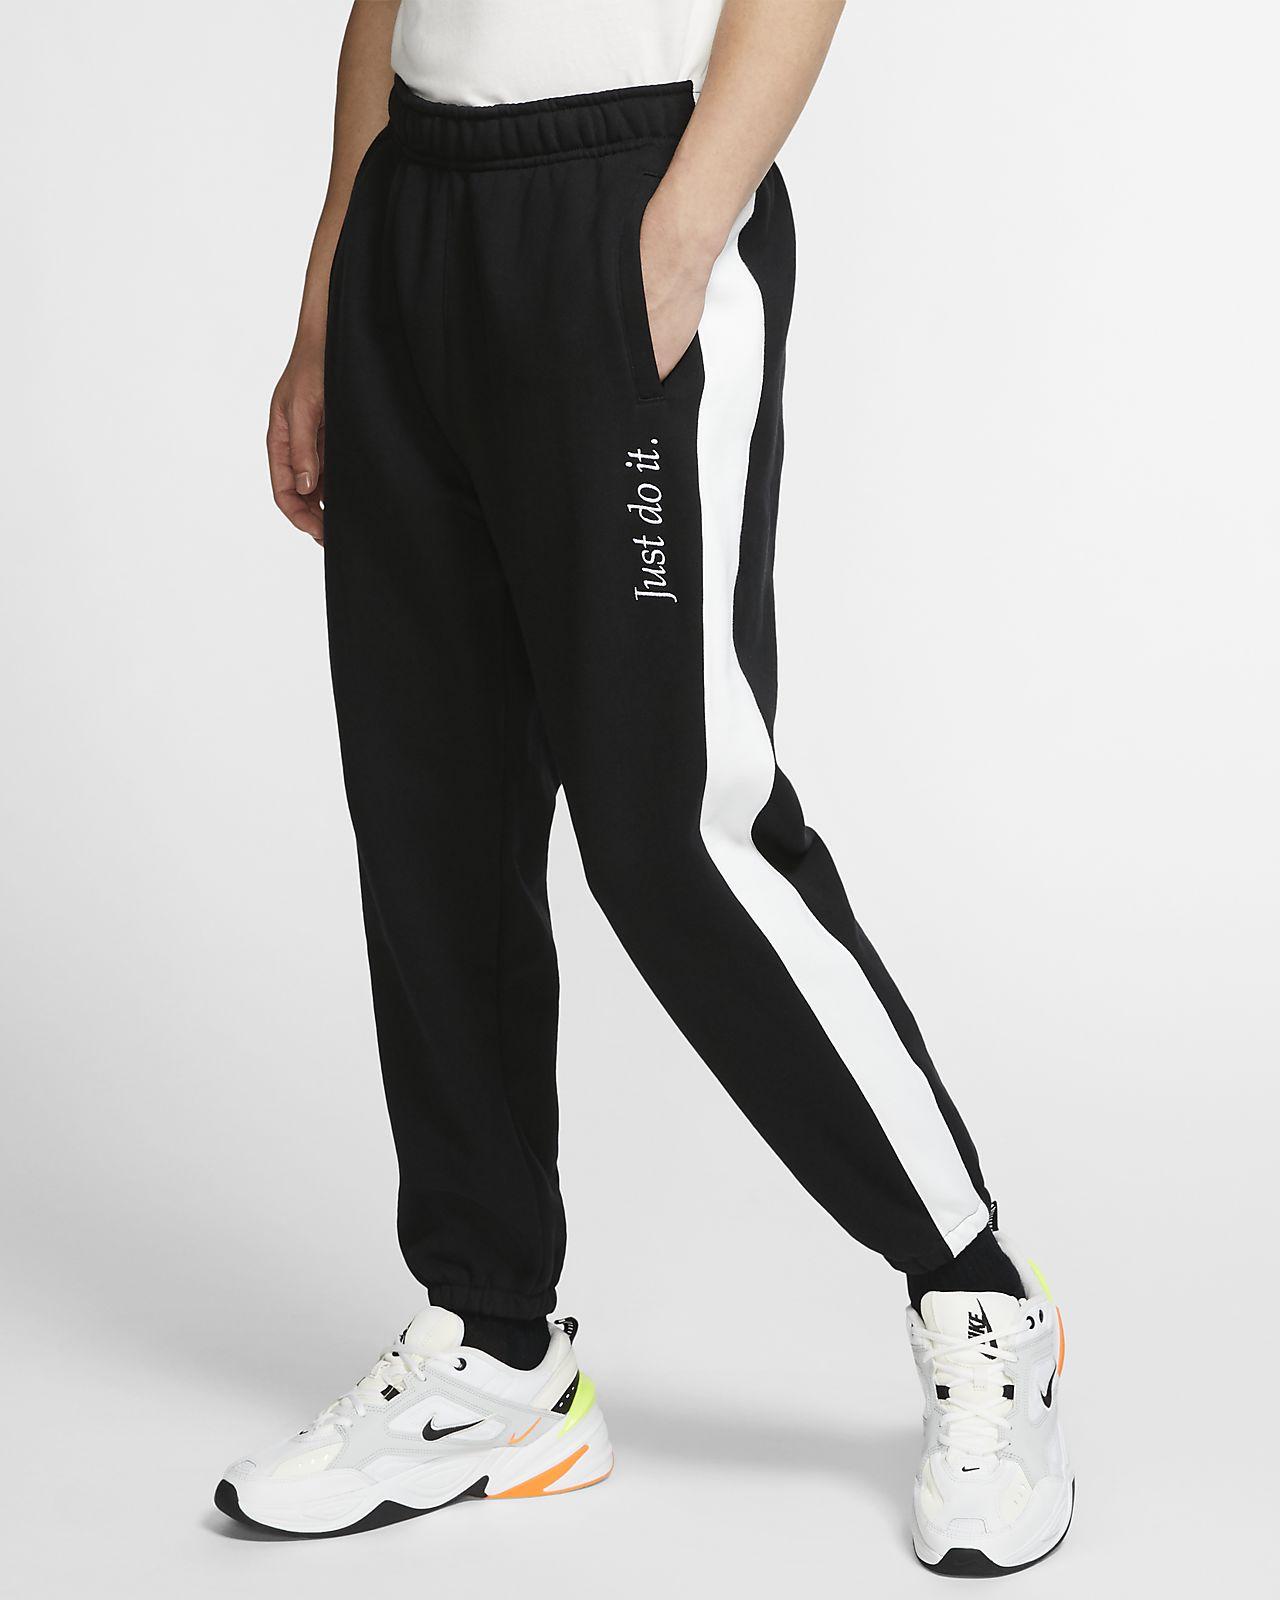 pantalon sport wear nike